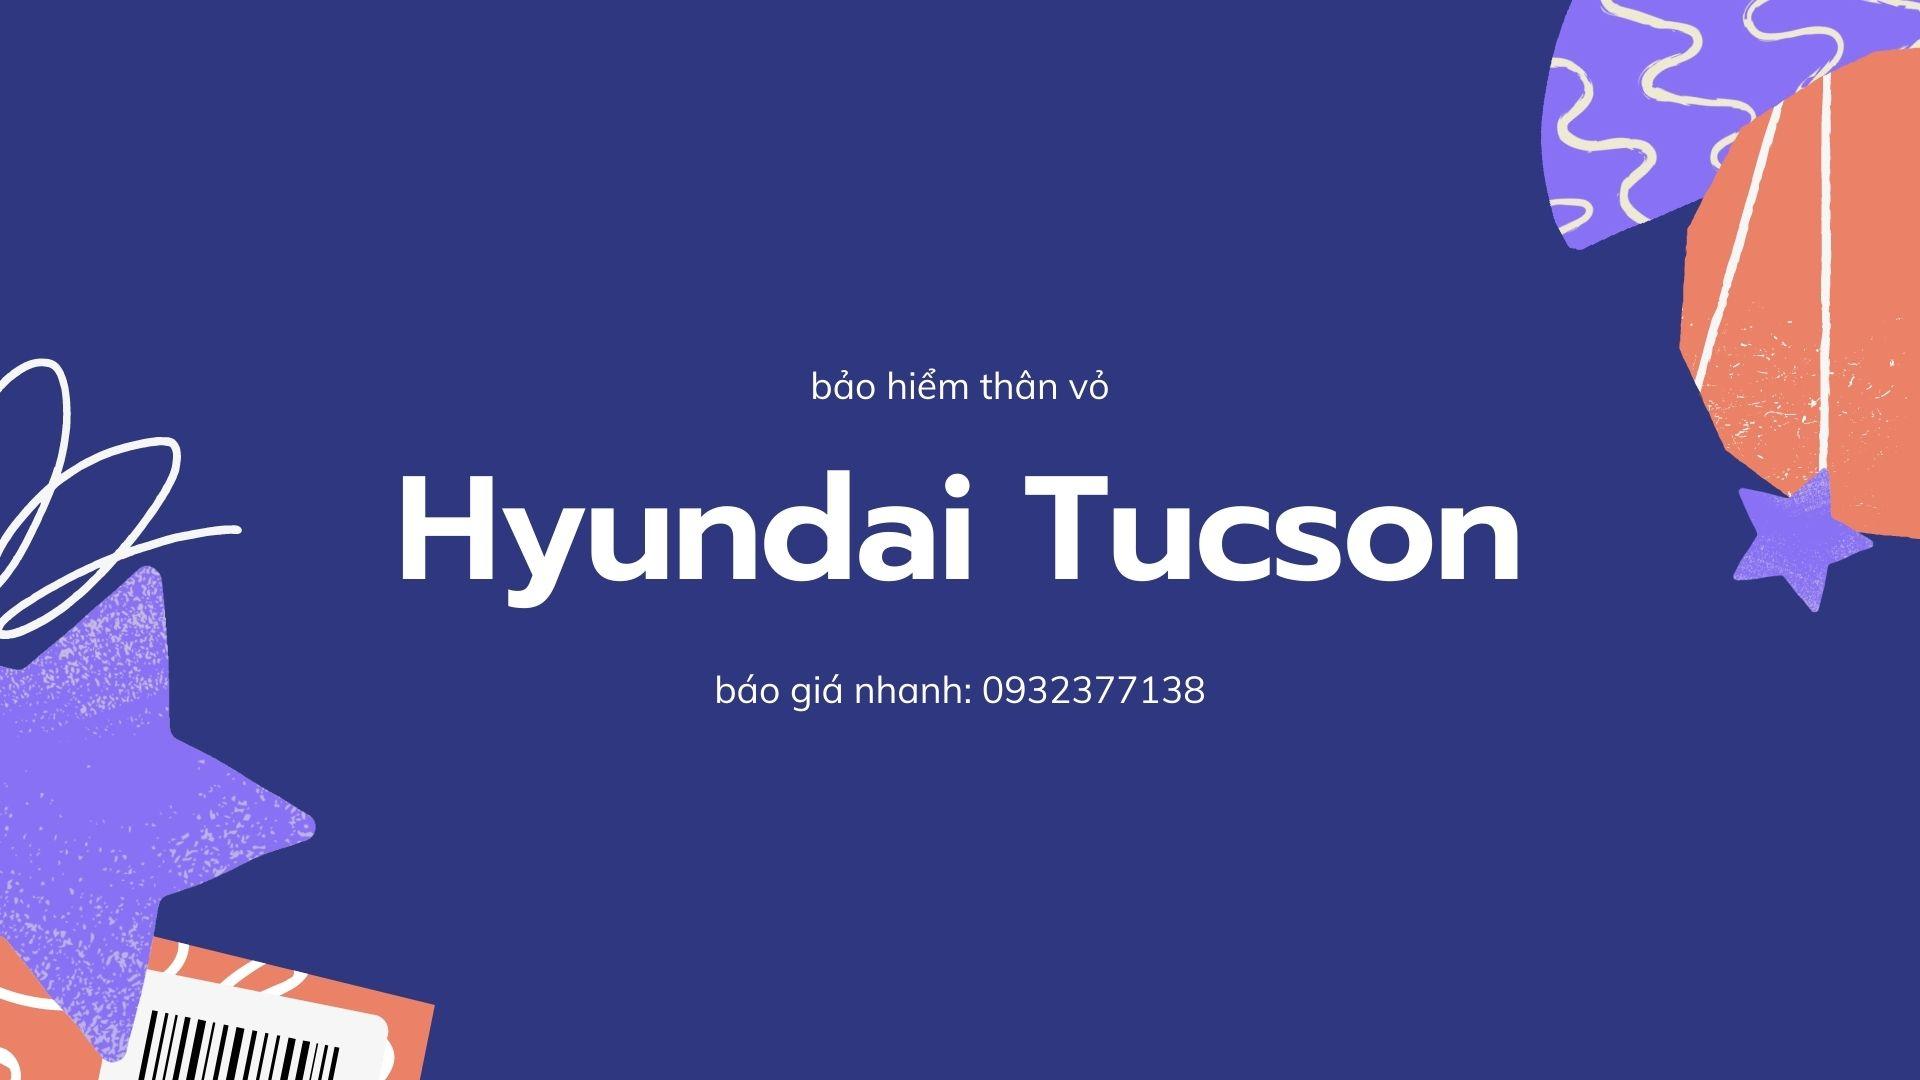 bảo hiểm thân vỏ xe hyundai tucson